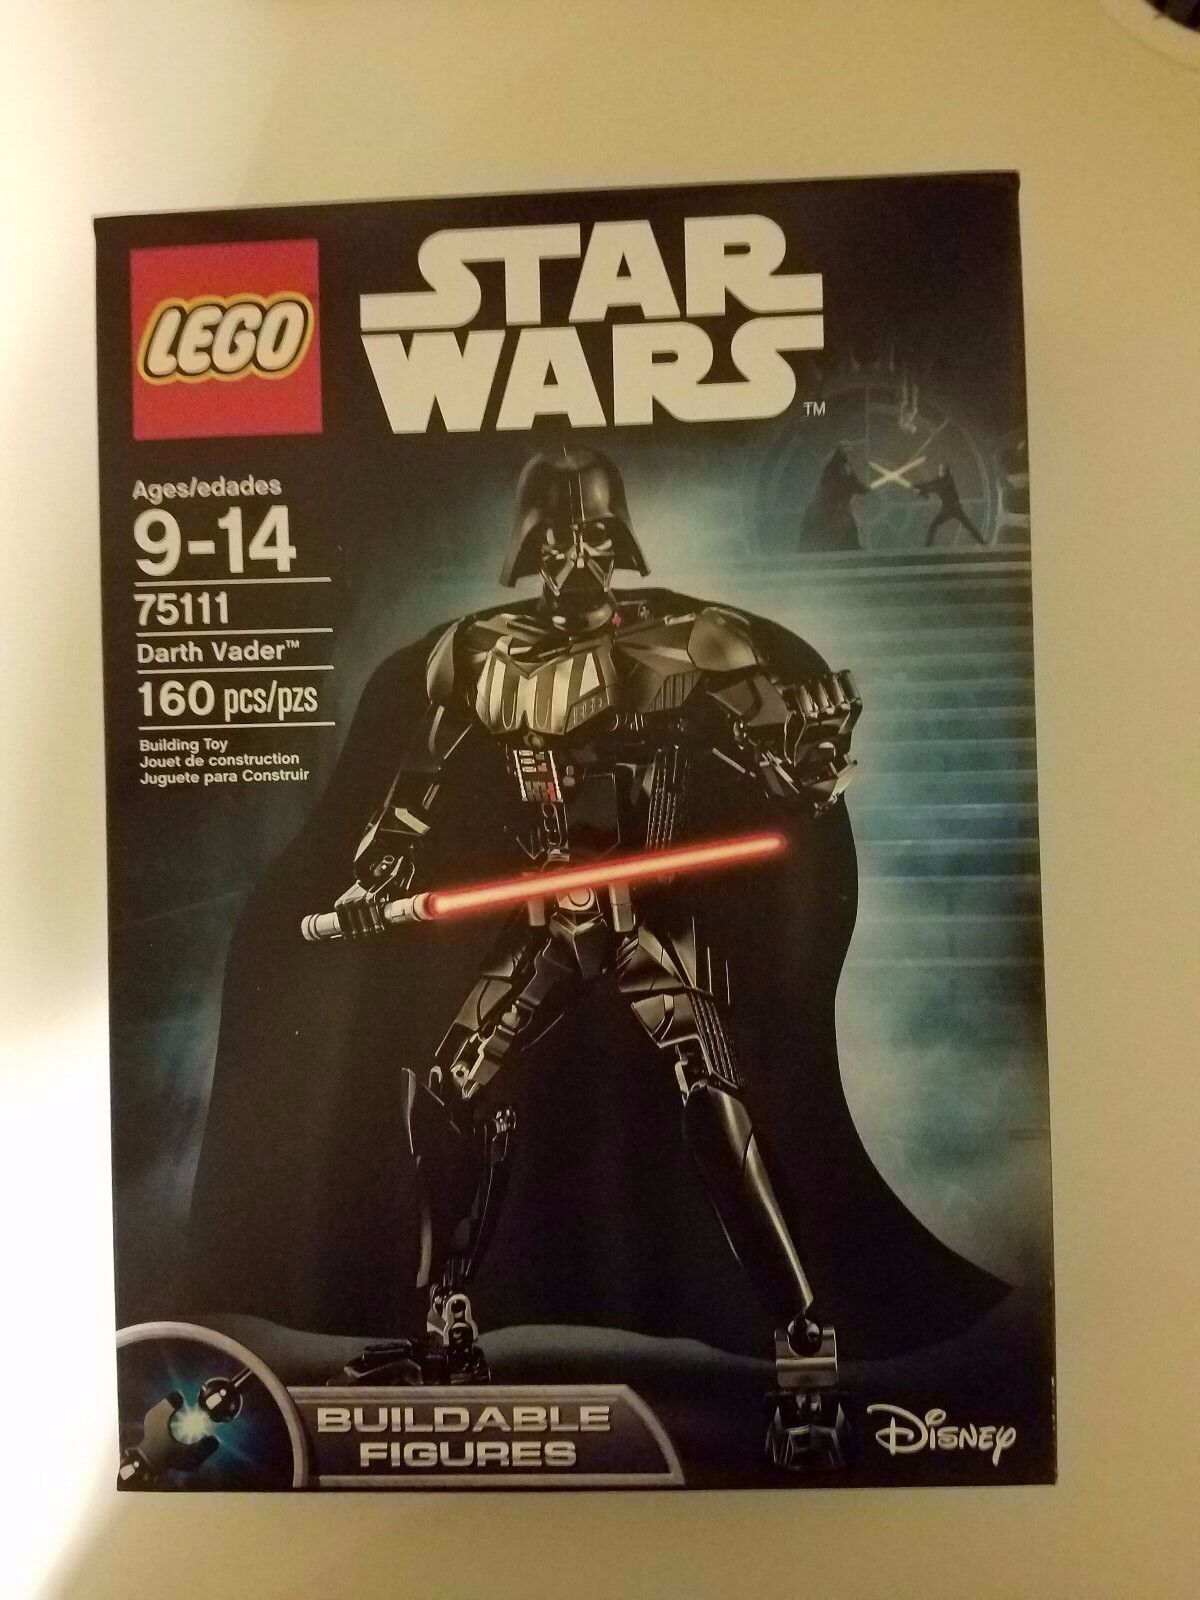 LEGO SET STAR STAR STAR WARS DARTH VADER 75111 BUILDABLE FIGURES 160 pcs HARD TO FIND 12da98